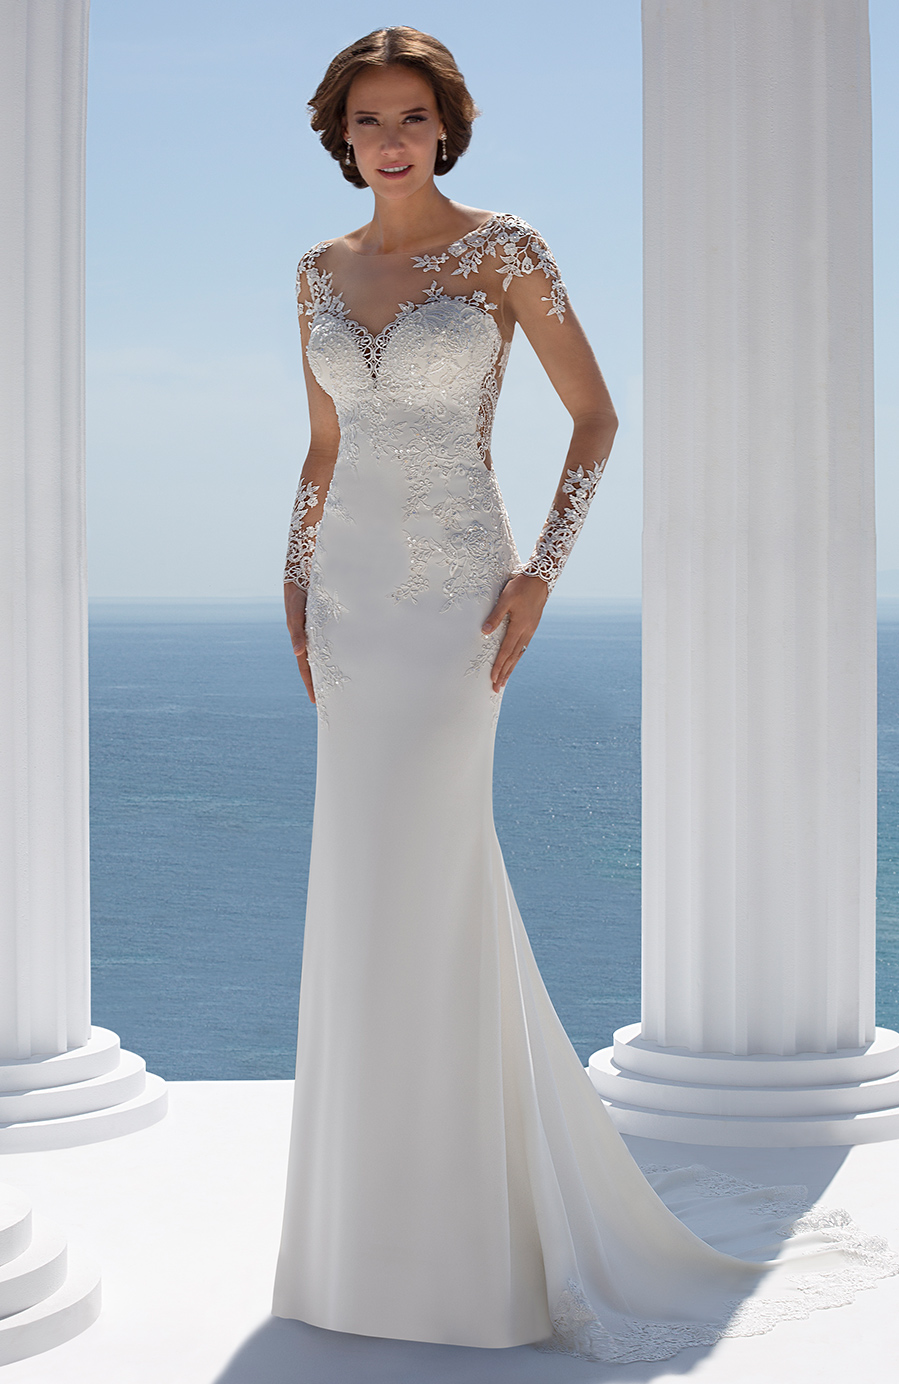 Mark Lesley 7330 Wedding Dress